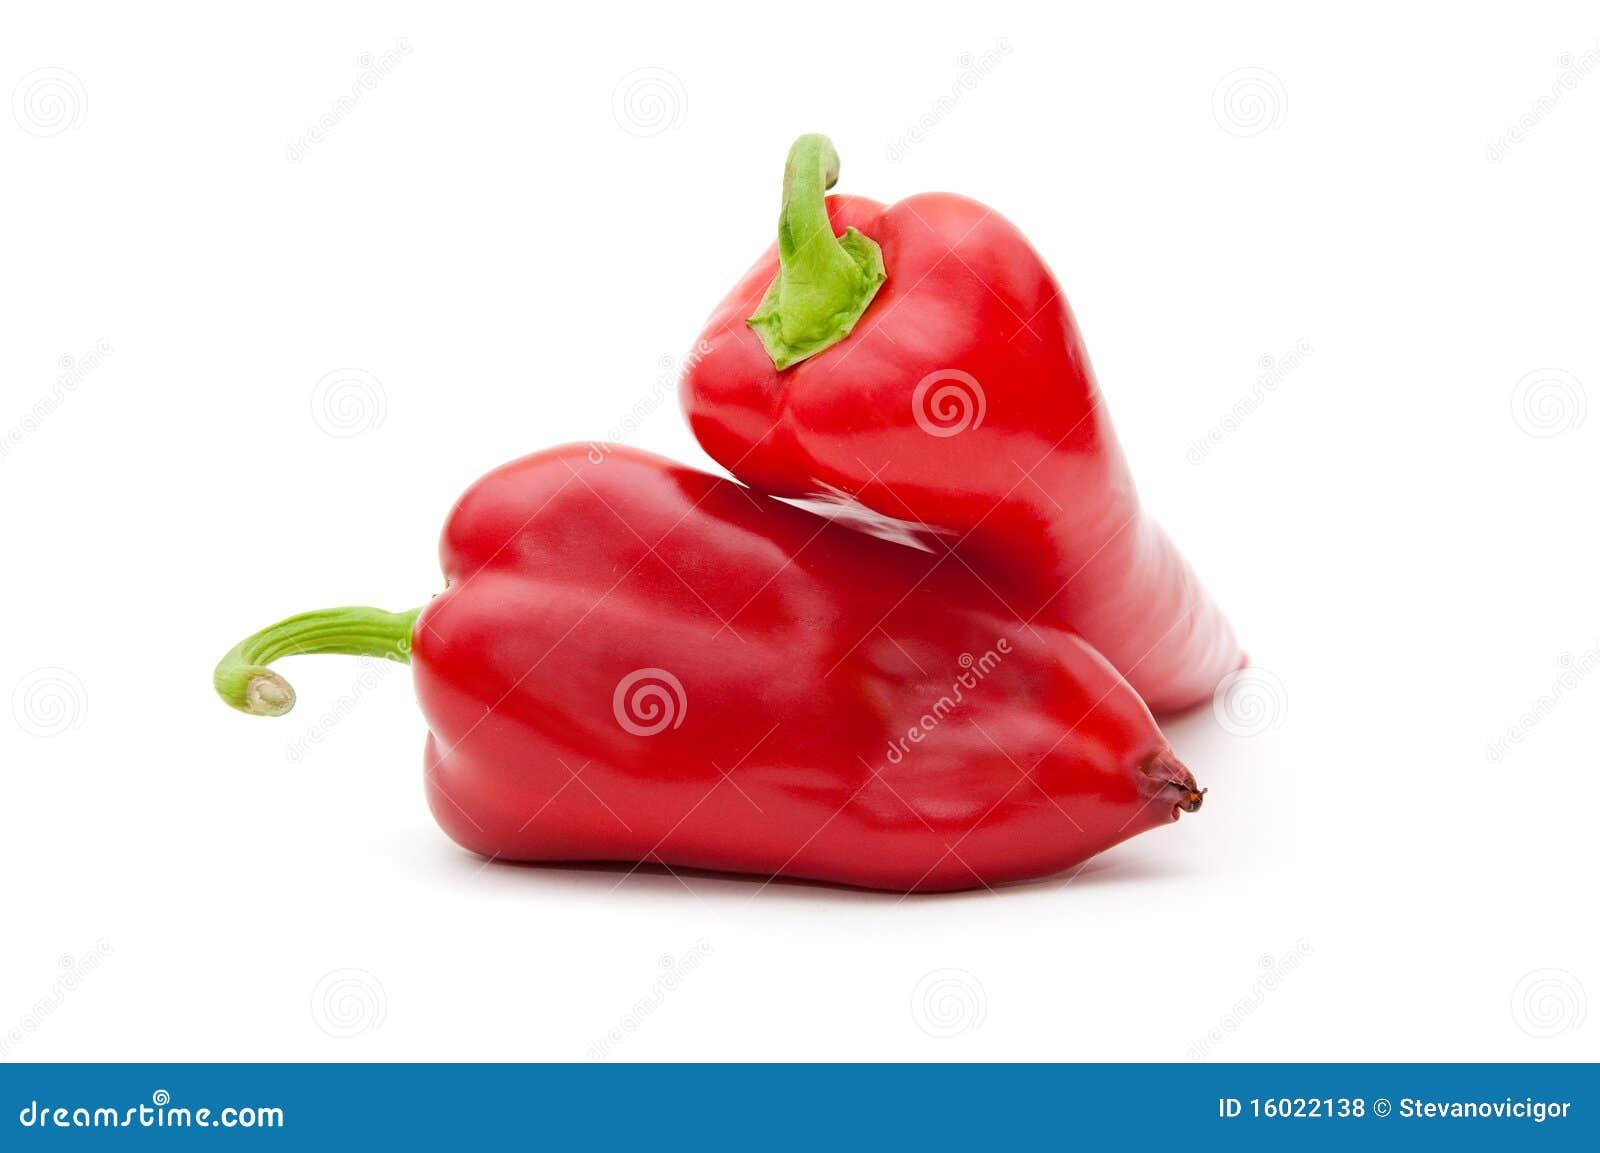 Rossa in calore italiana milf moglie arrapata redhead wife italian hot 5